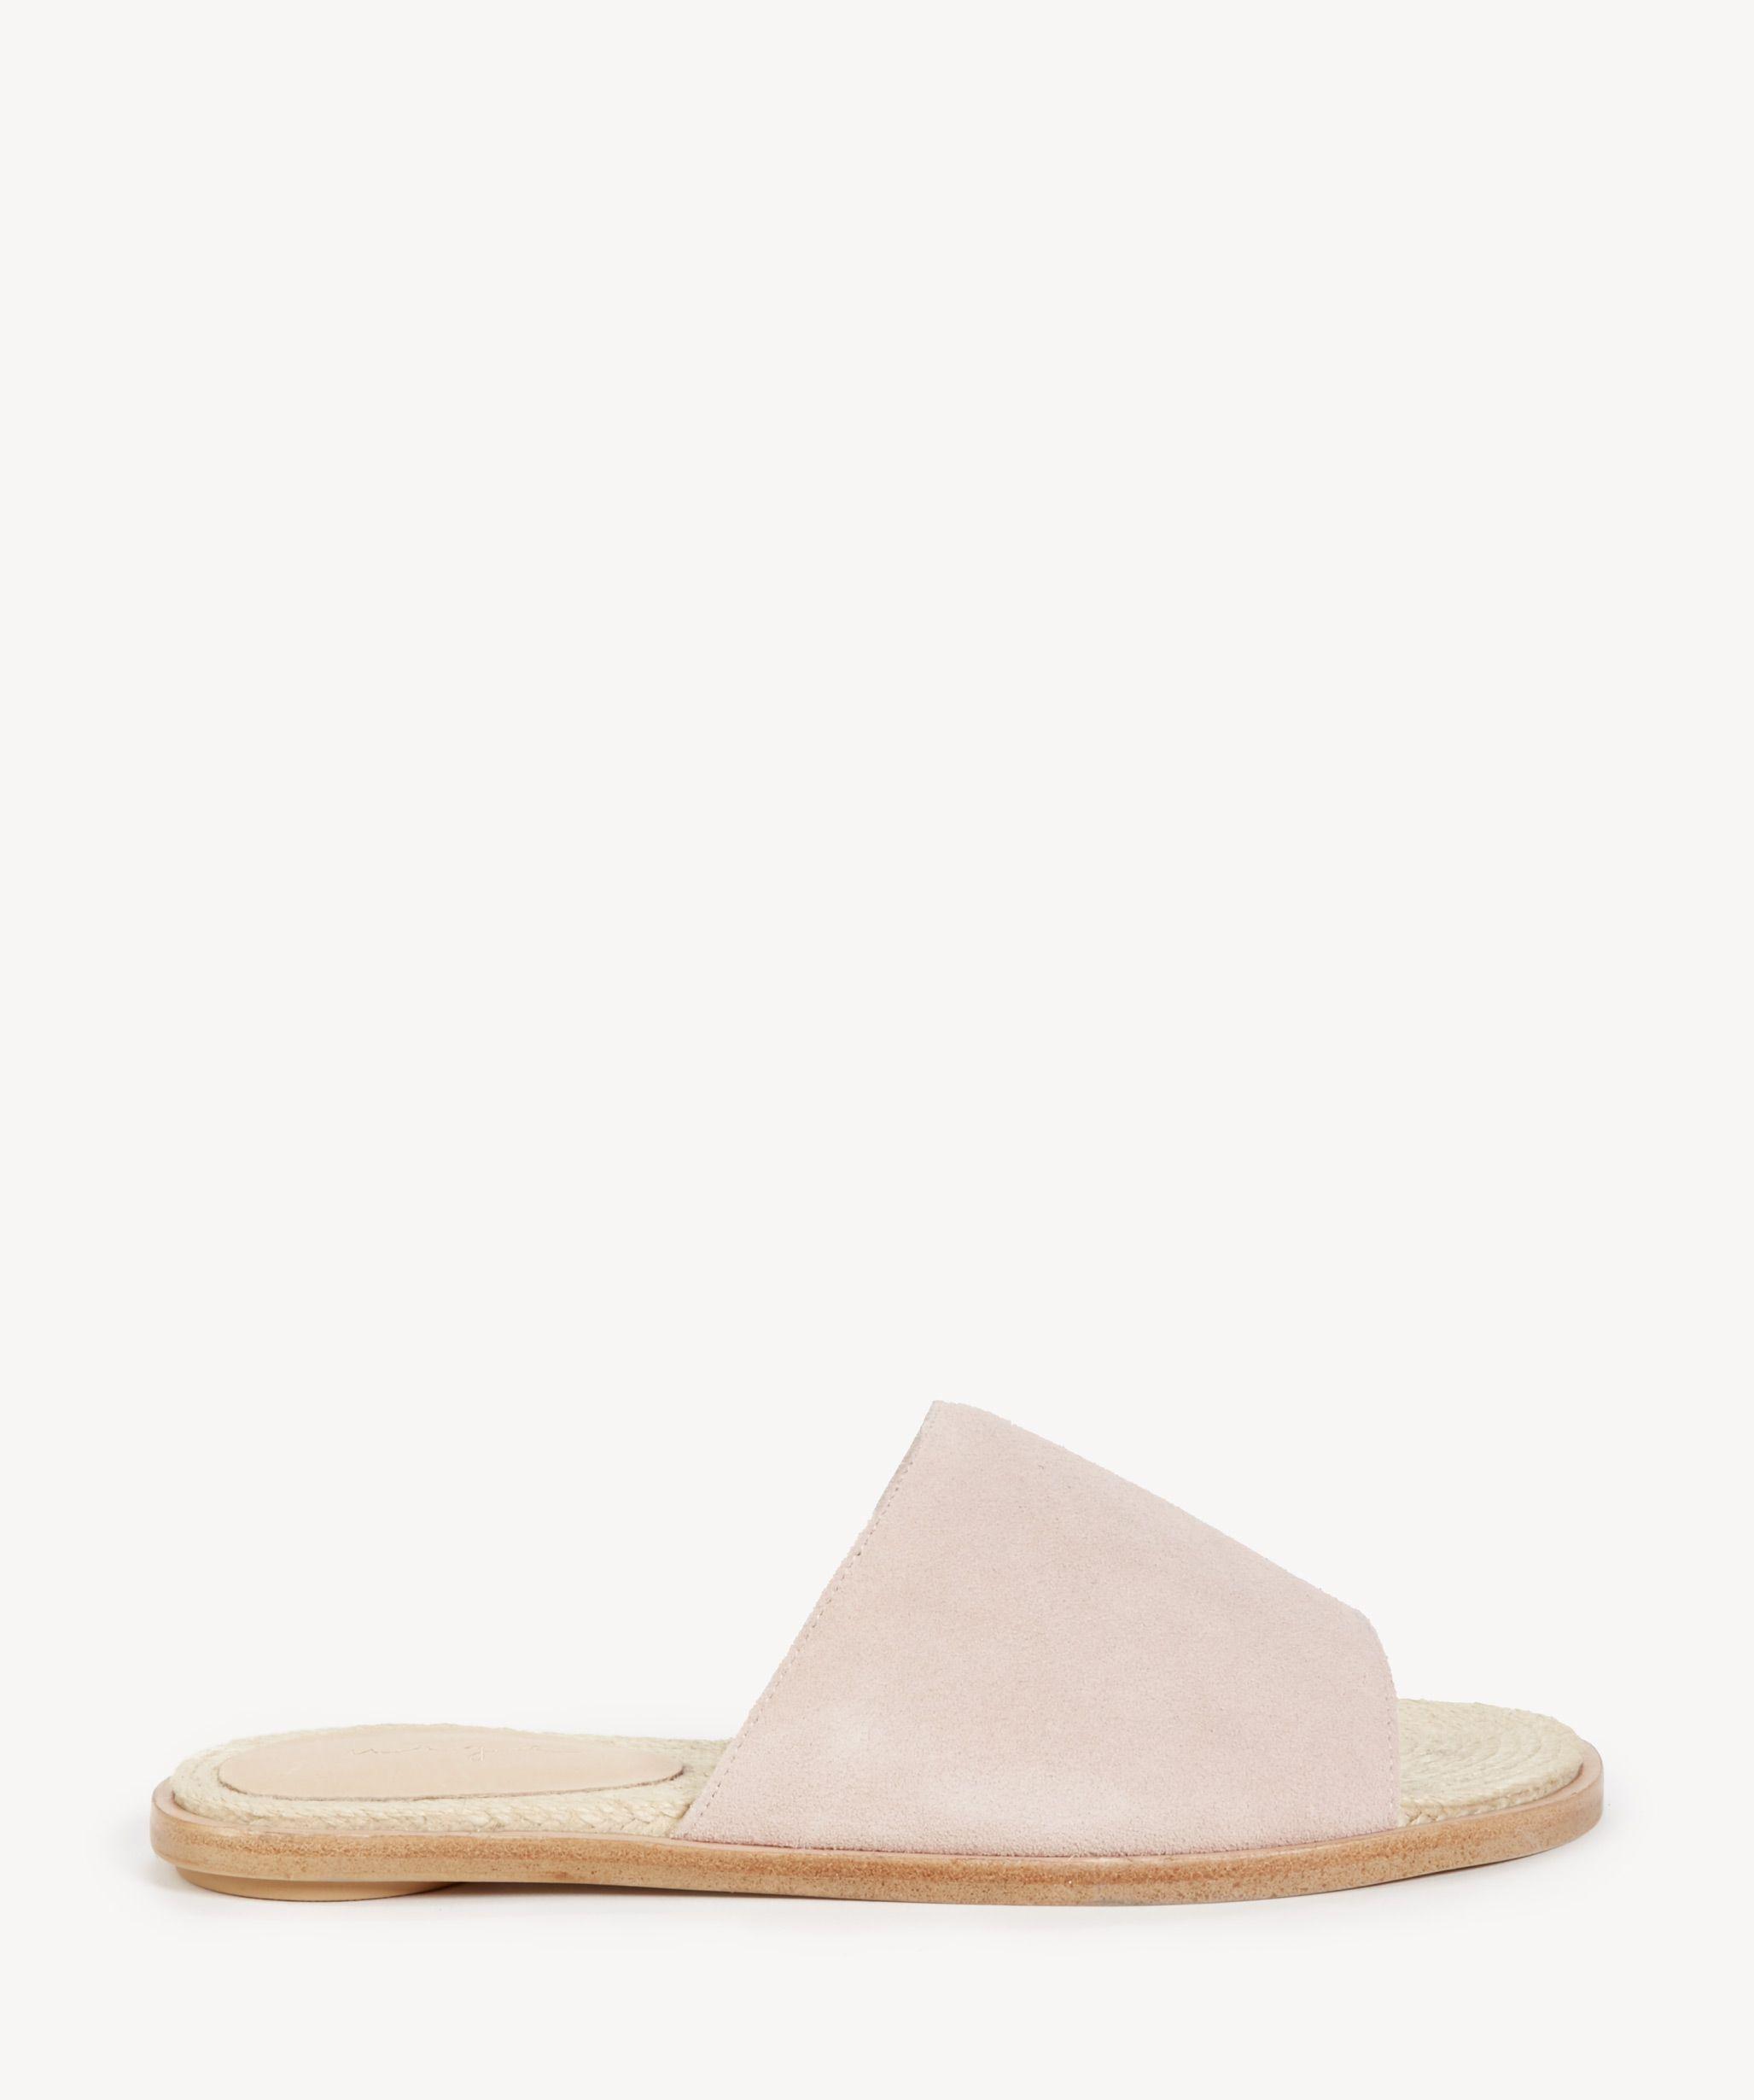 a95bf27624c Urge Latesha Flats Sandals Blush